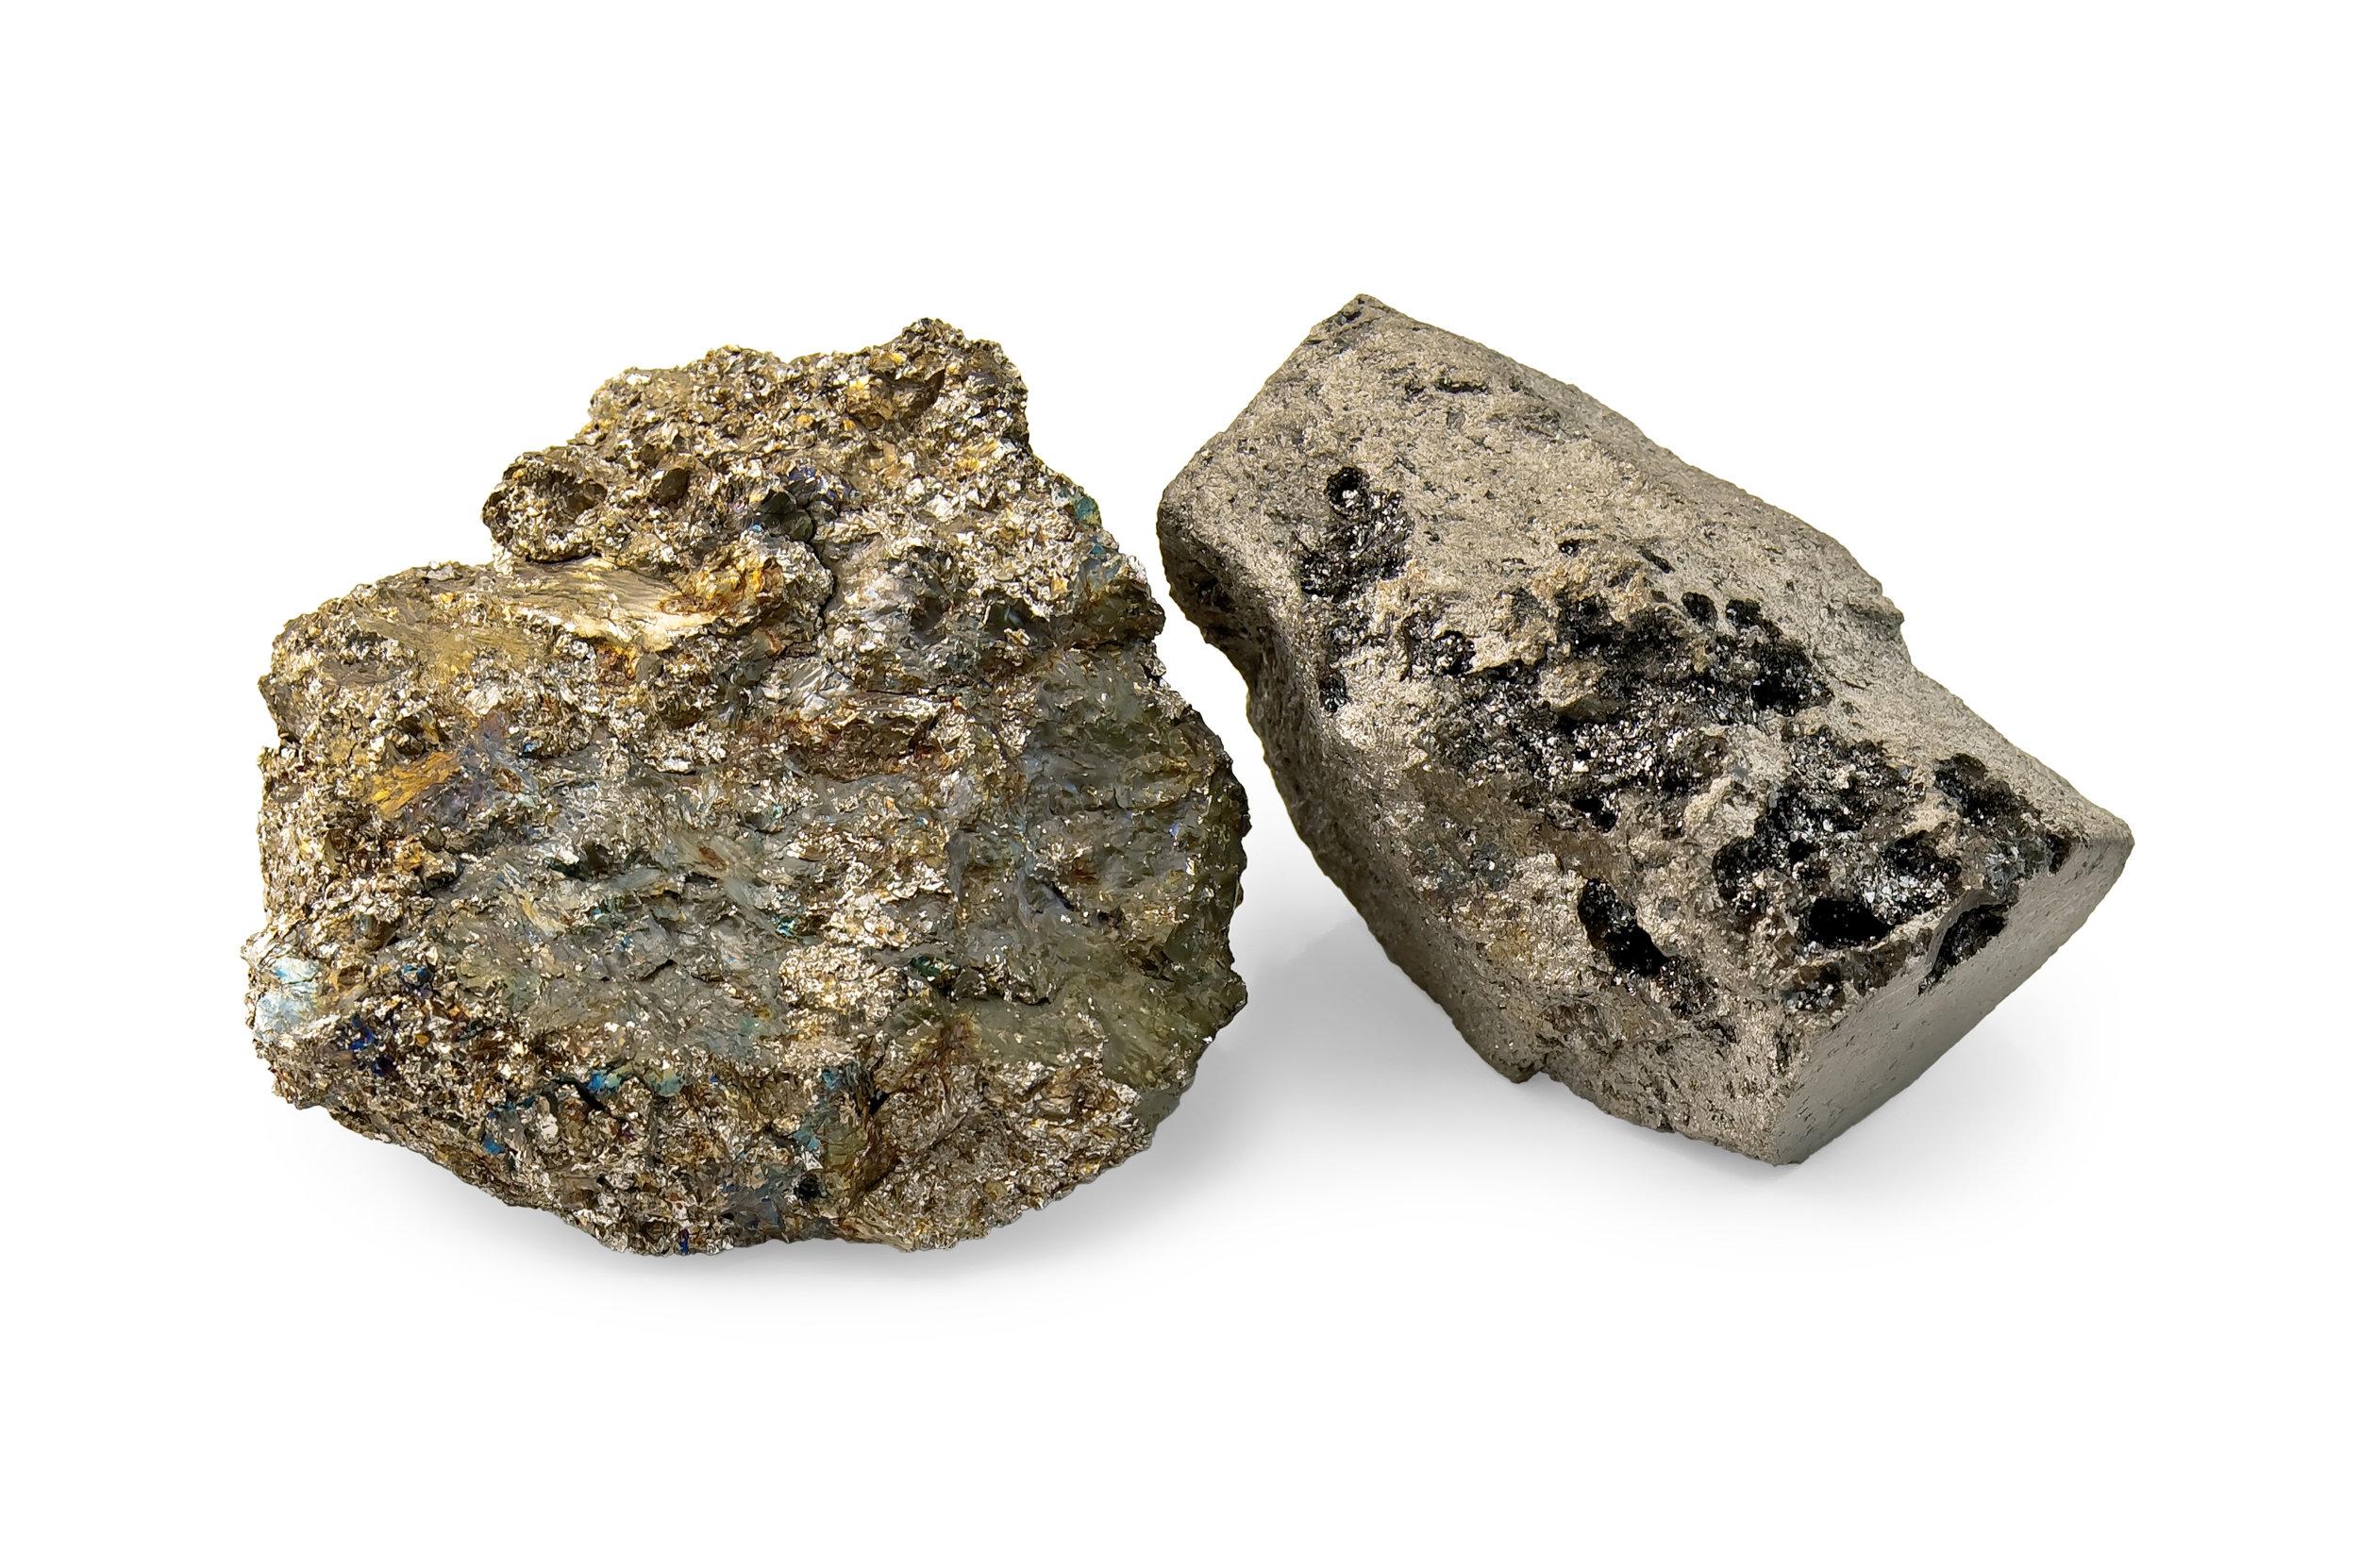 Production of ferroalloys from secondary raw materials